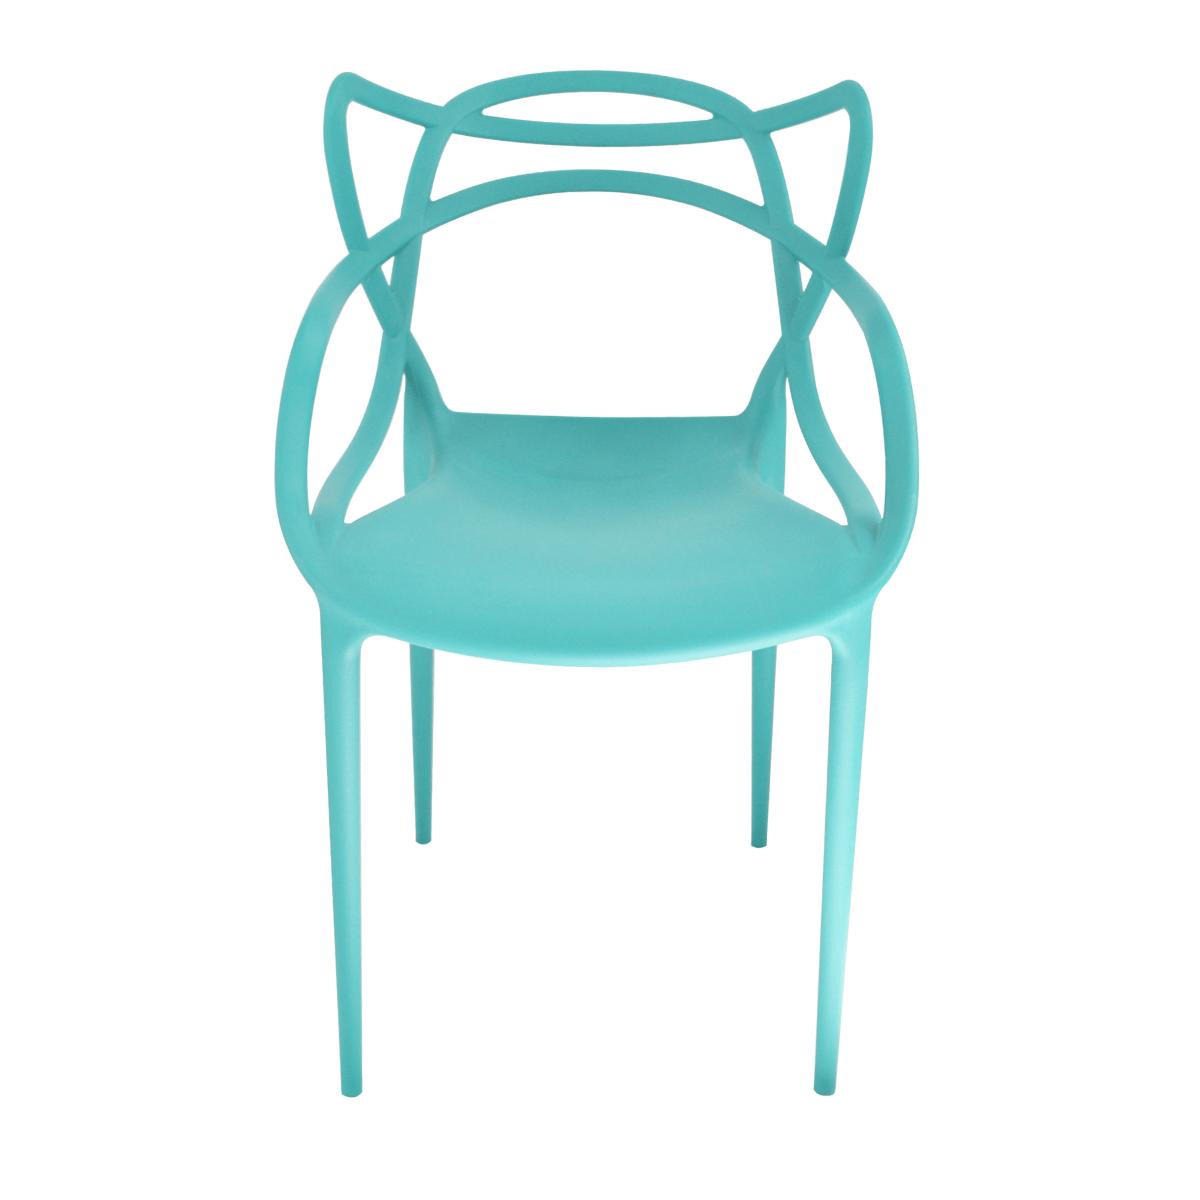 Cadeira Allegra Azul Turquesa/ Tiffany